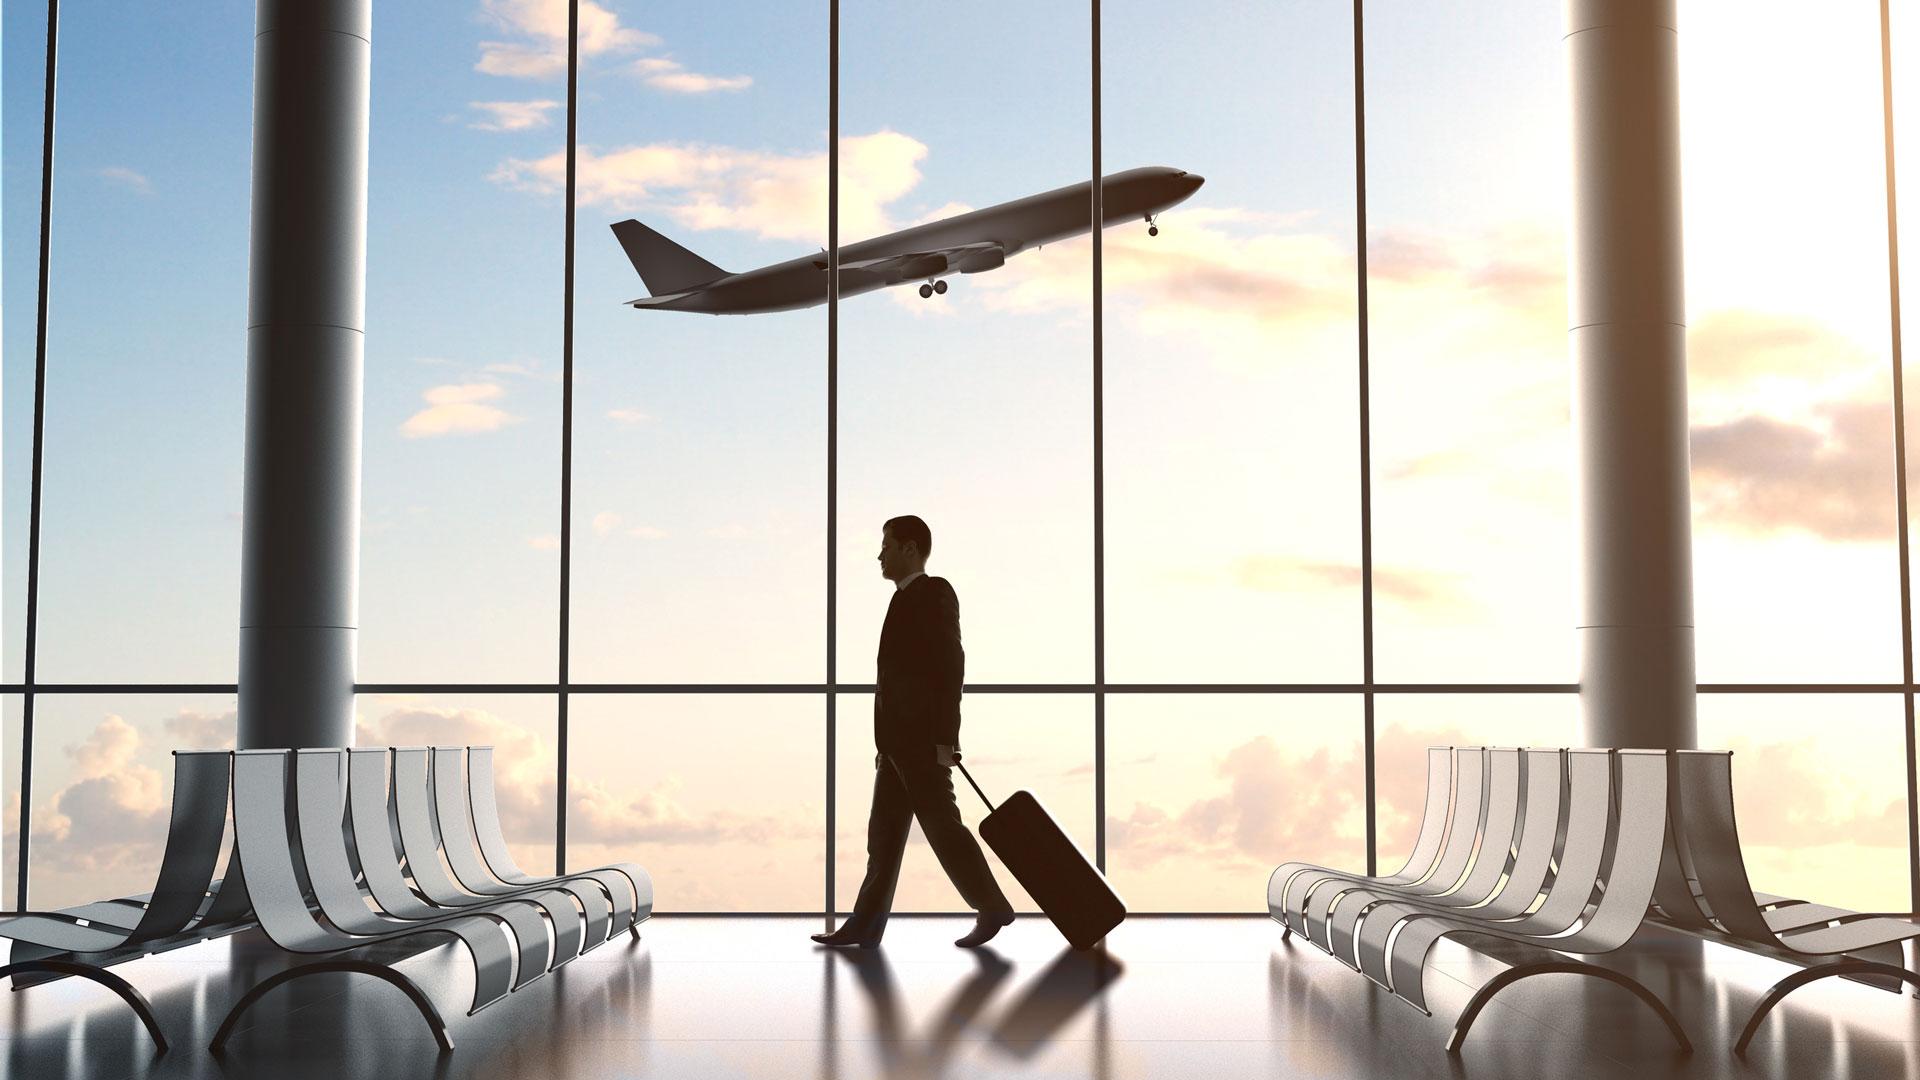 Perth Airport Transfer Per Chauffeur Amp Airport Transport